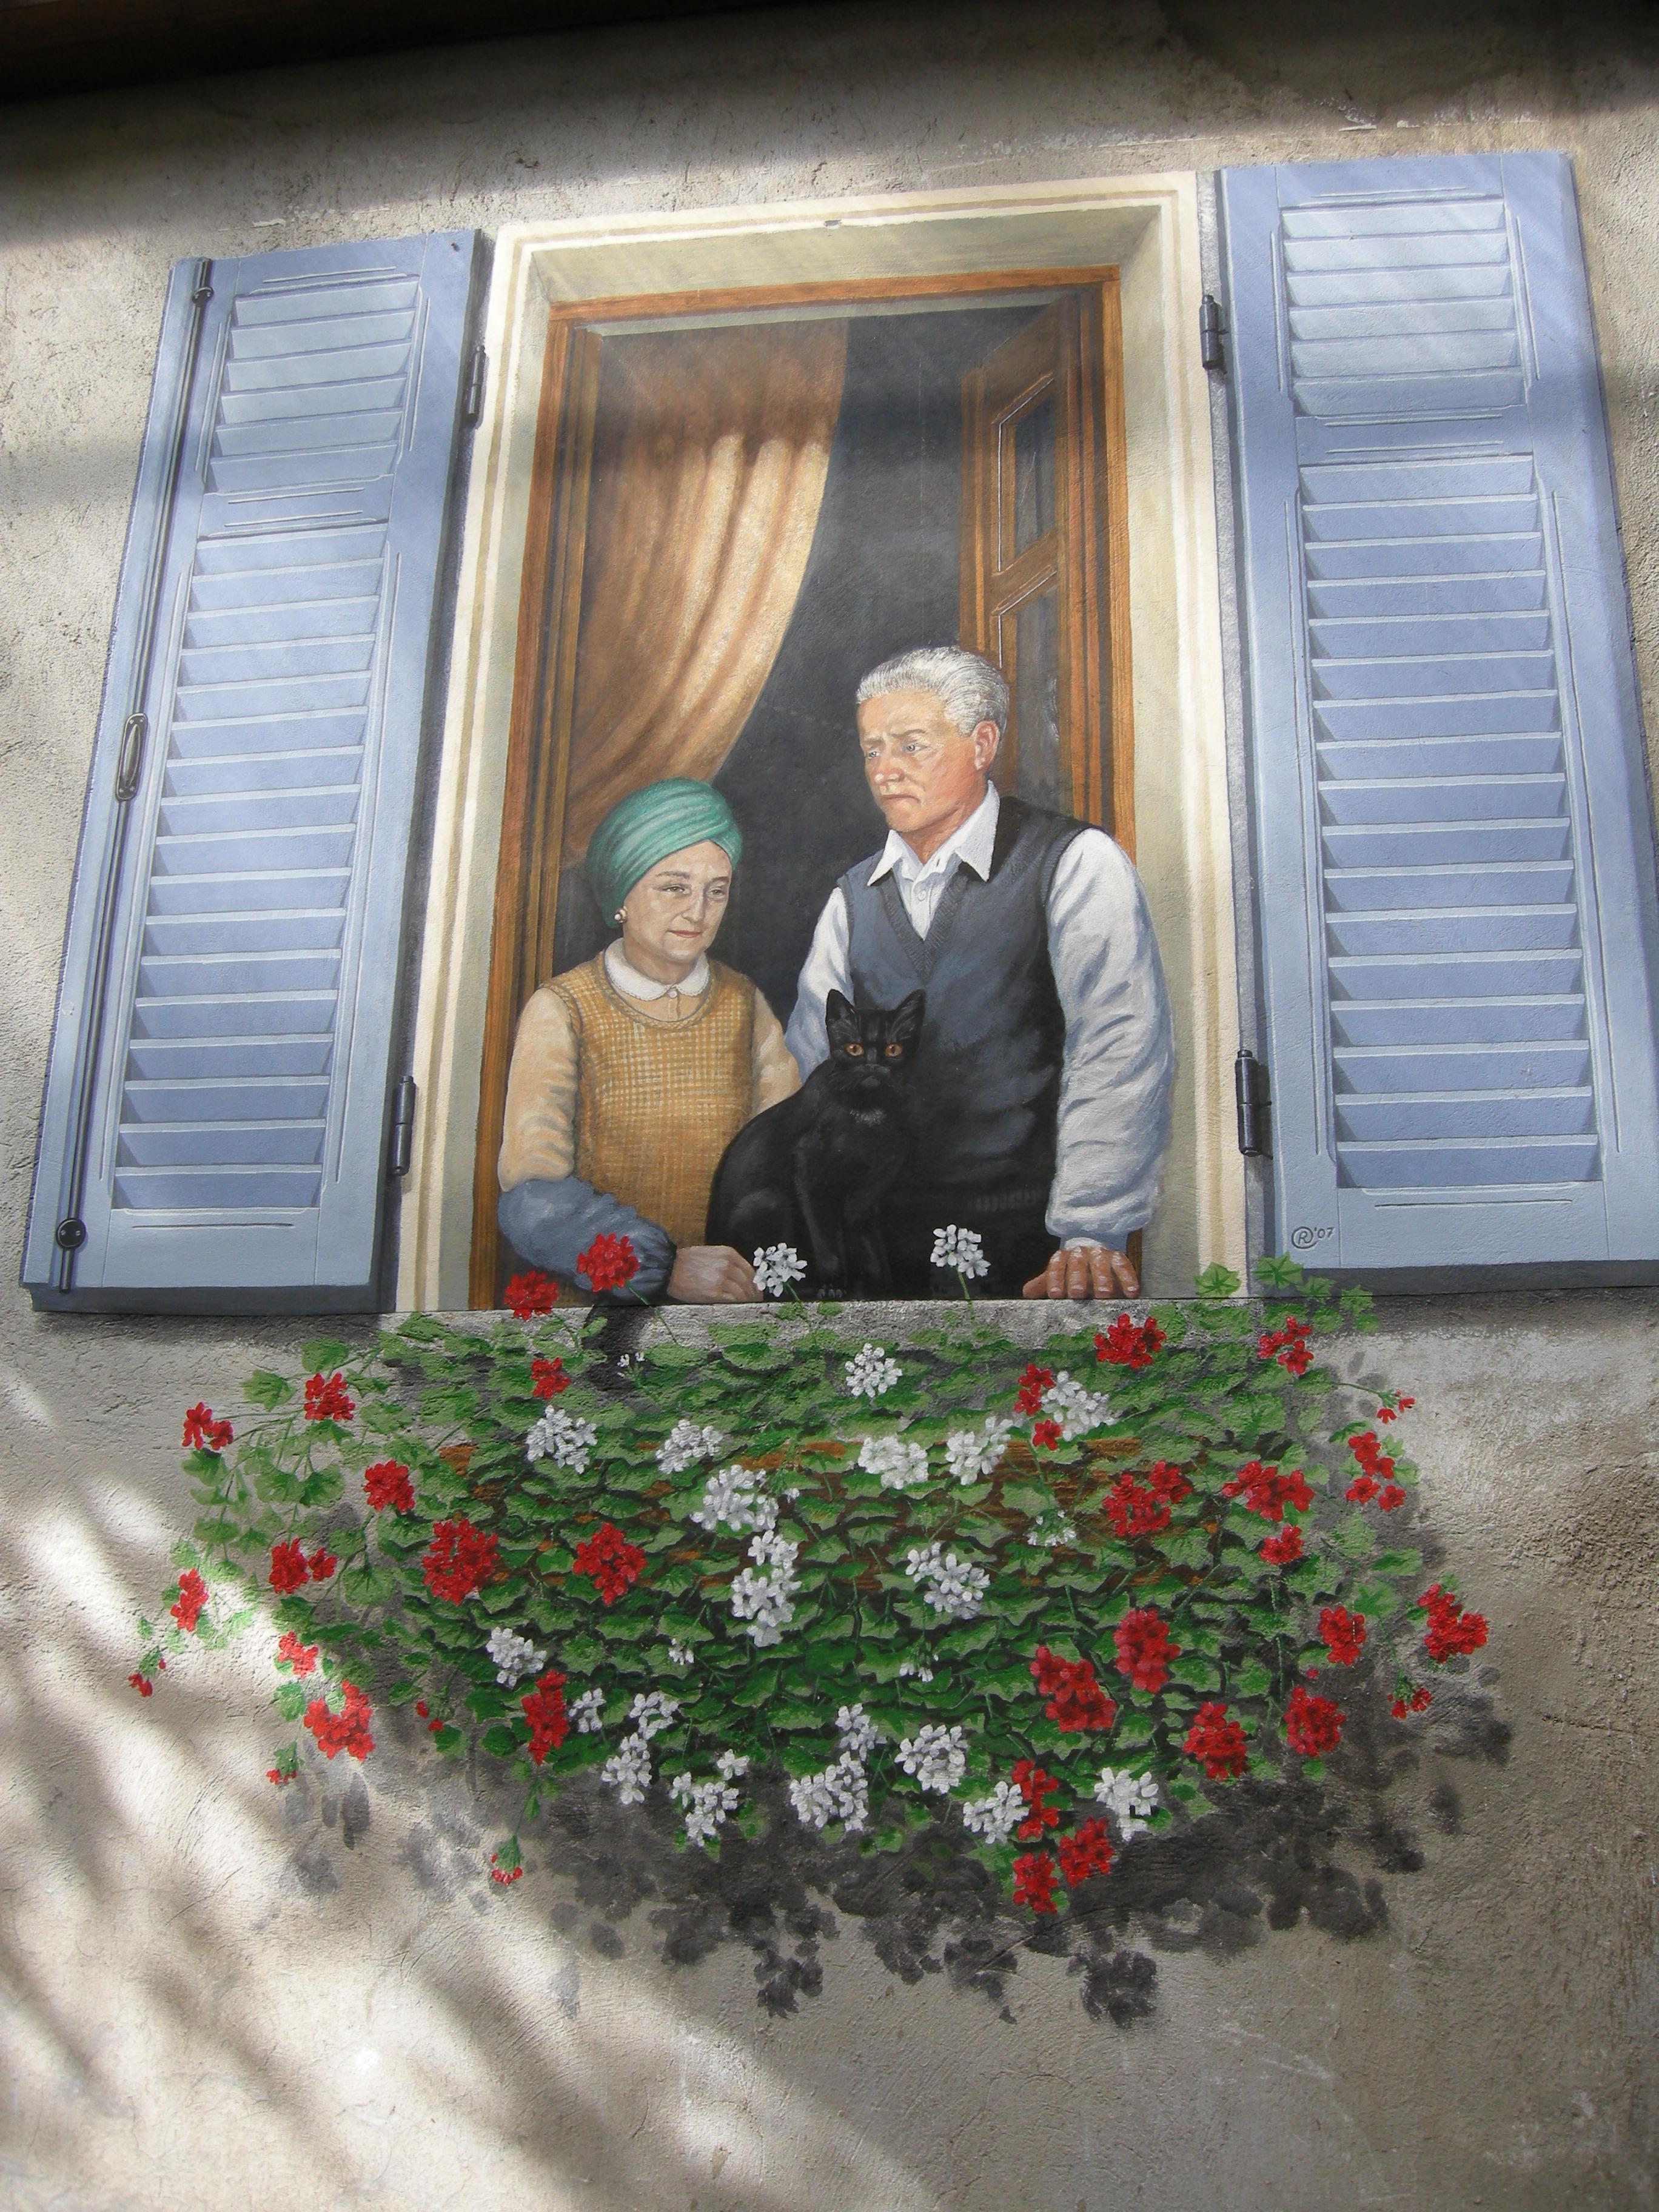 la finestra degli zii.jpg